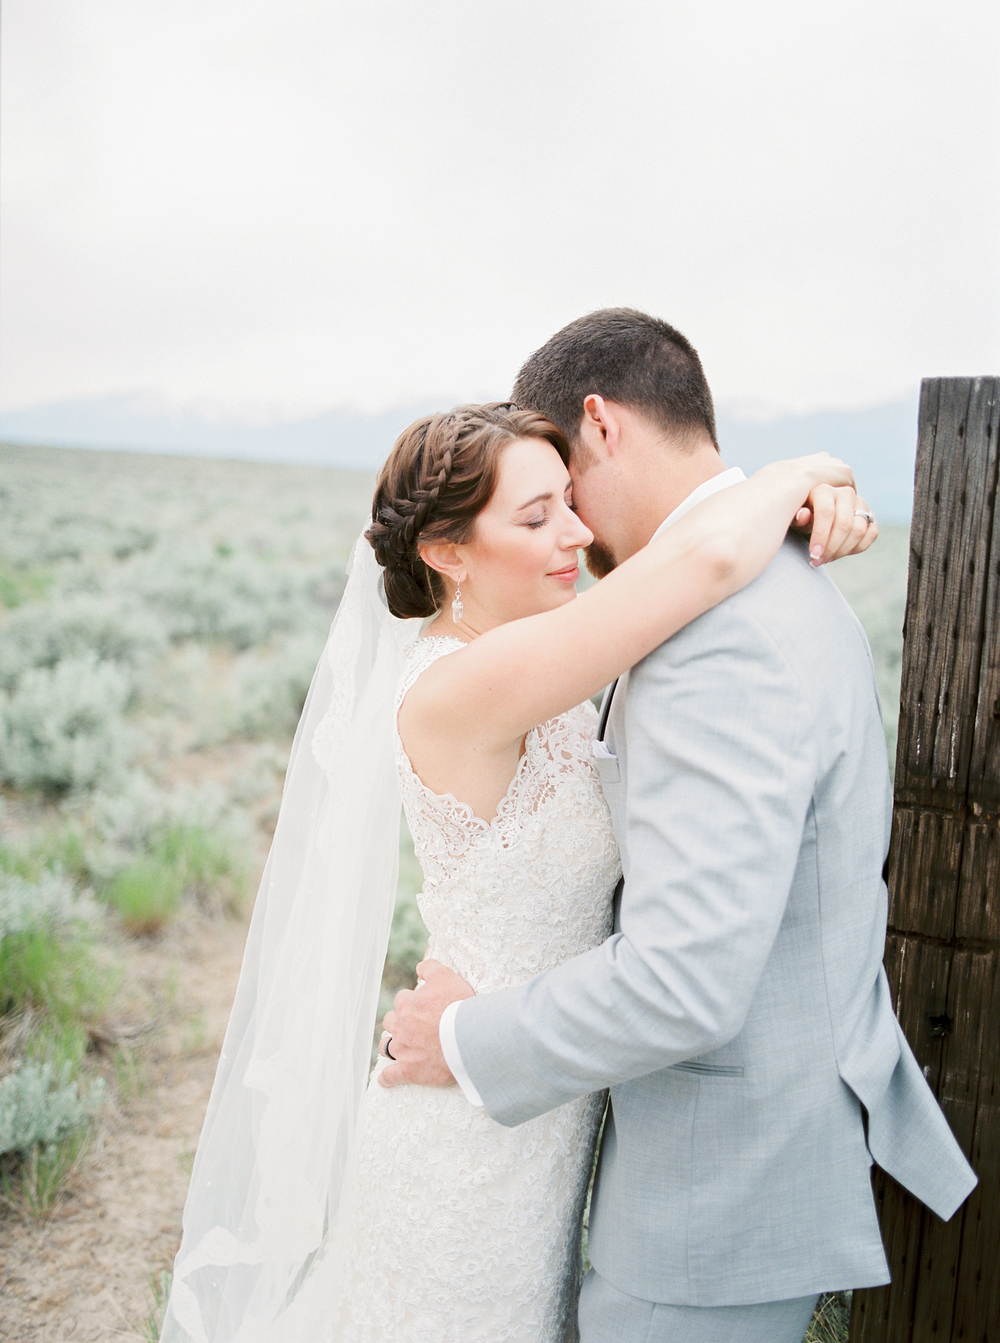 Wedding Couple | Bitterroot Valley | Montana Wedding Photographer | Stella Kelsie Photography